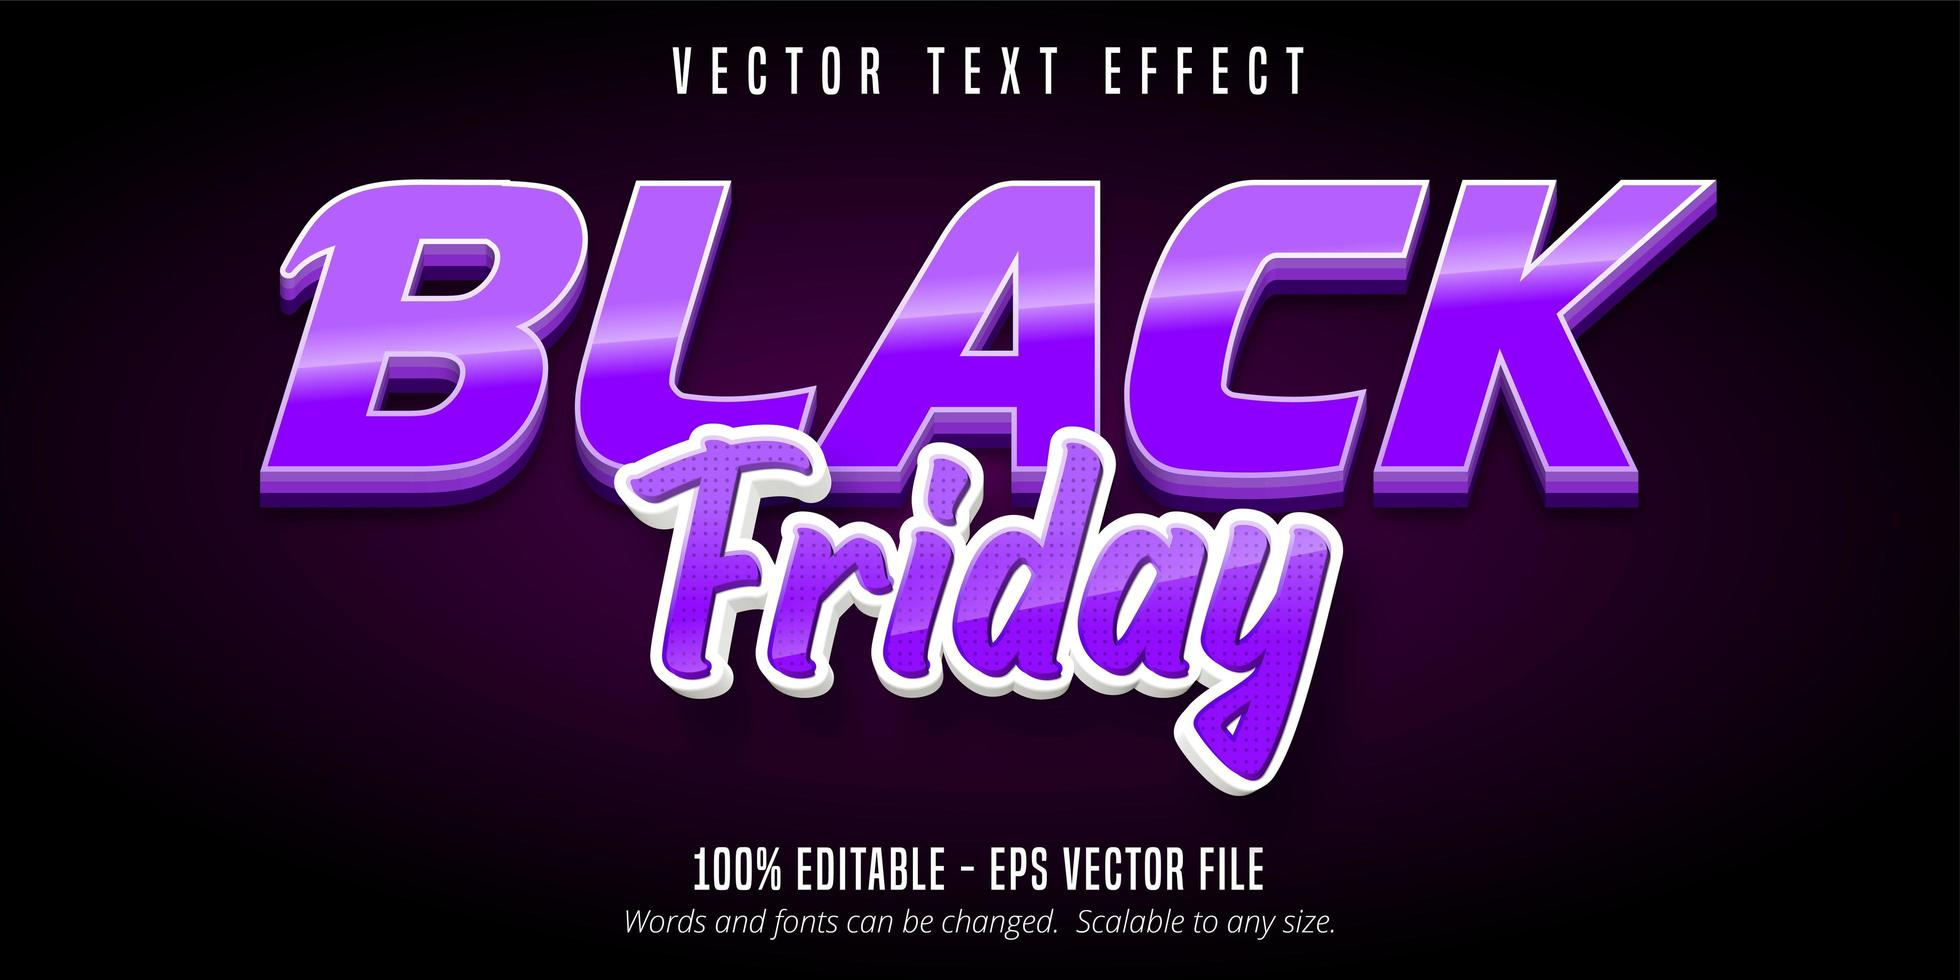 efecto de texto editable de viernes negro púrpura vector